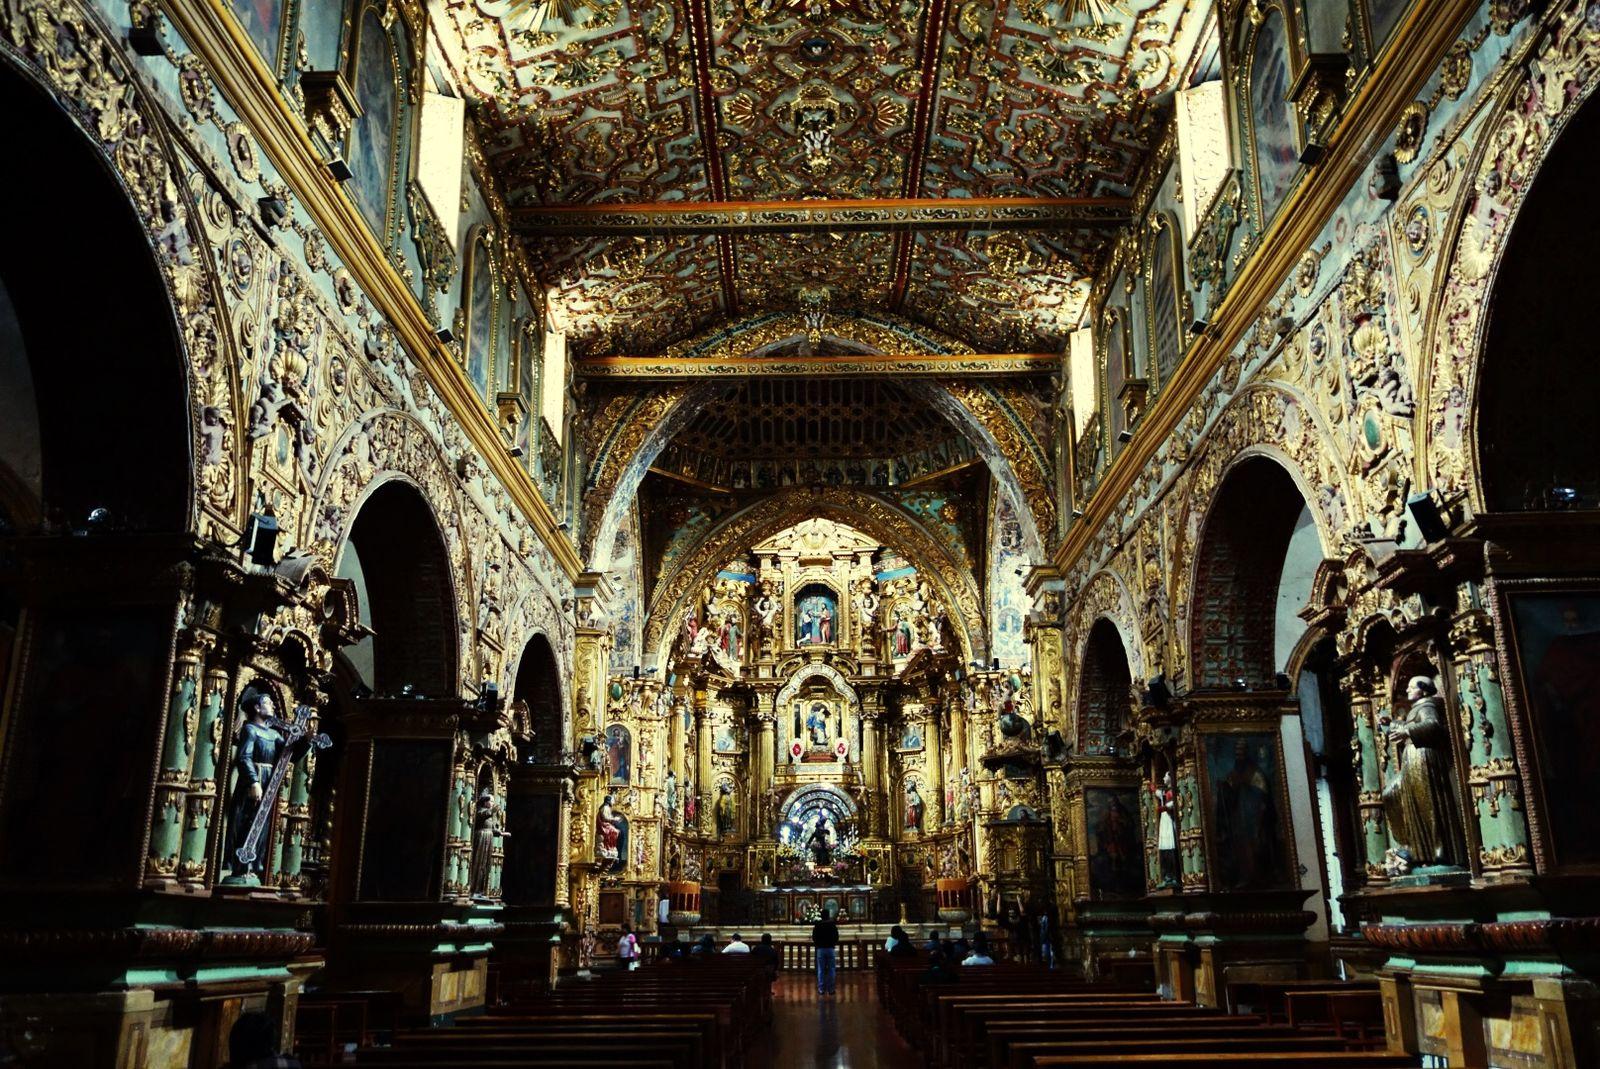 Amazing Architecture It's amazing growing up with beautiful cathedrals like these Primer Patrimonio De La Humanidad Lindo Quito De Mi Vida The Architect - 2015 EyeEm Awards